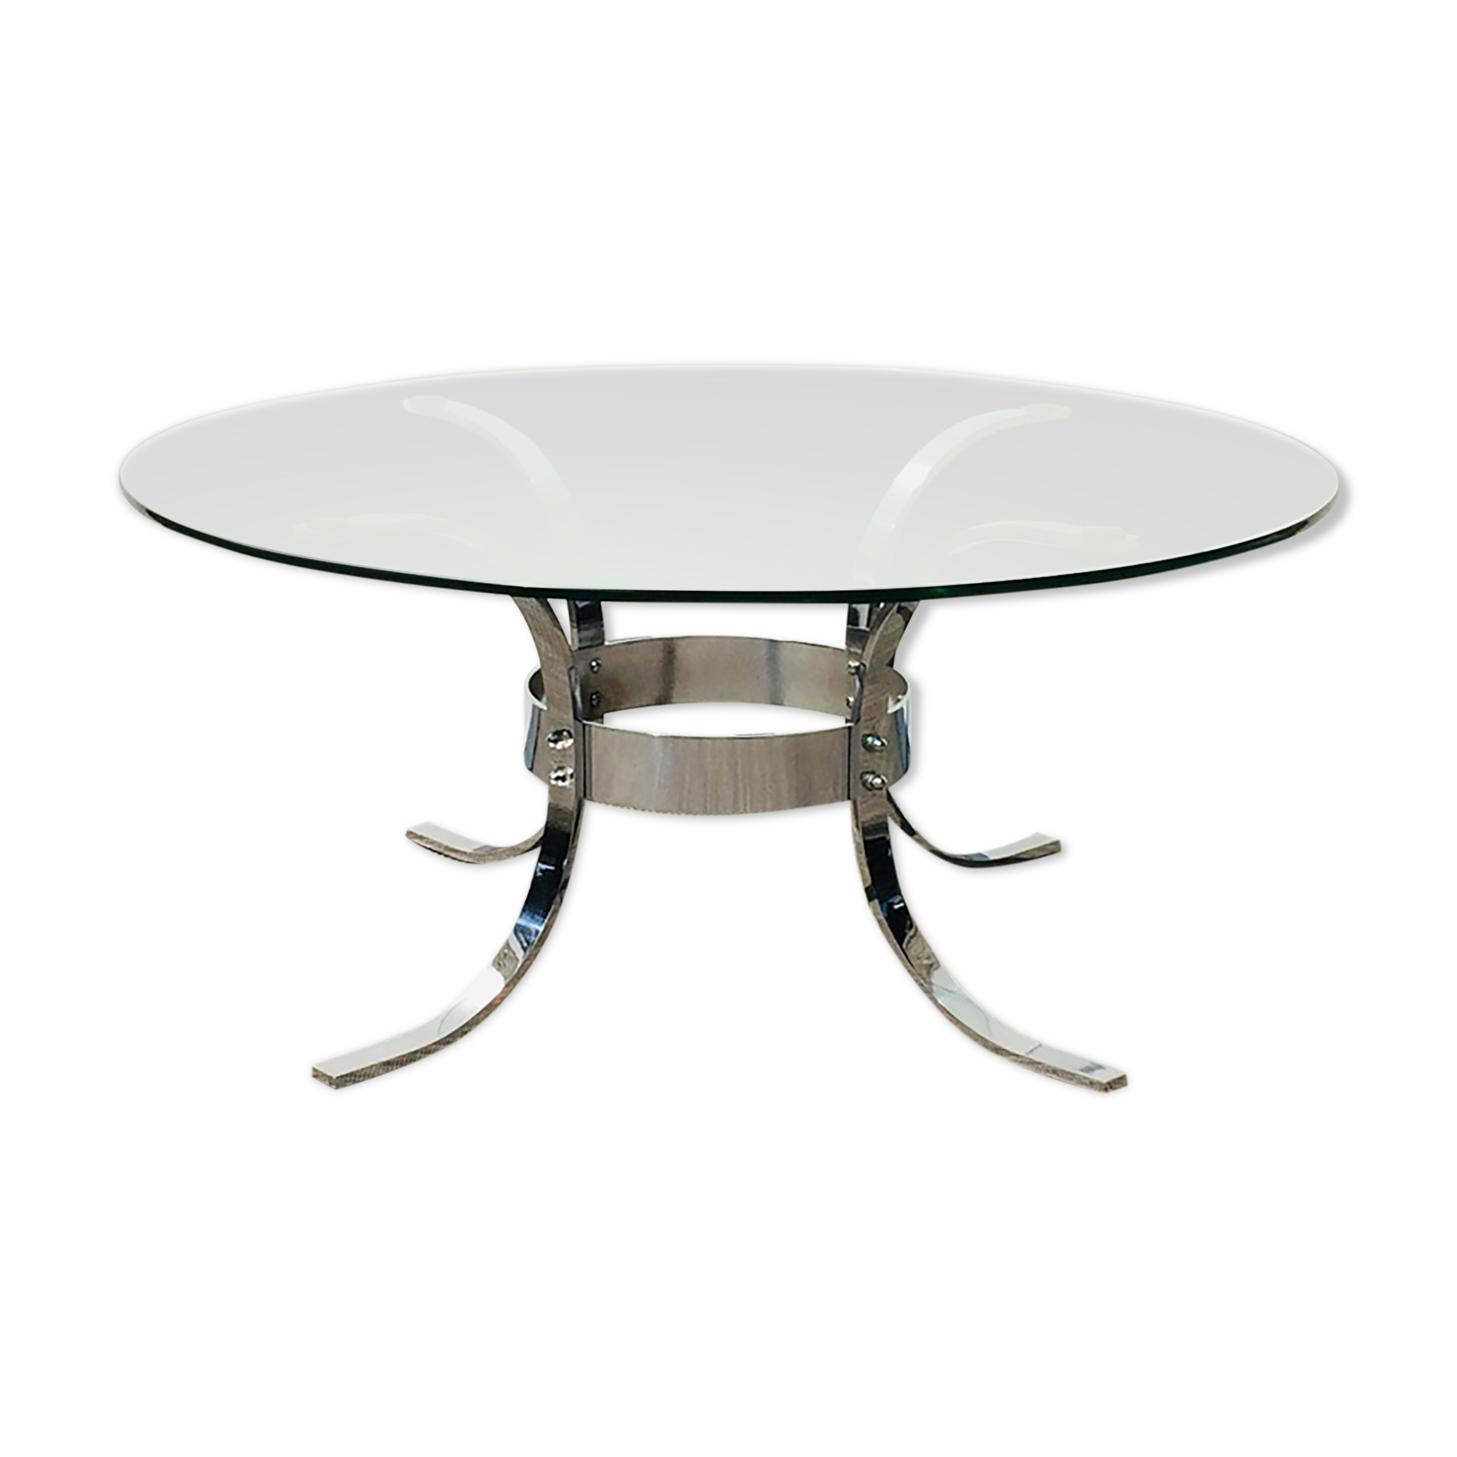 Table basse ronde vintage 70